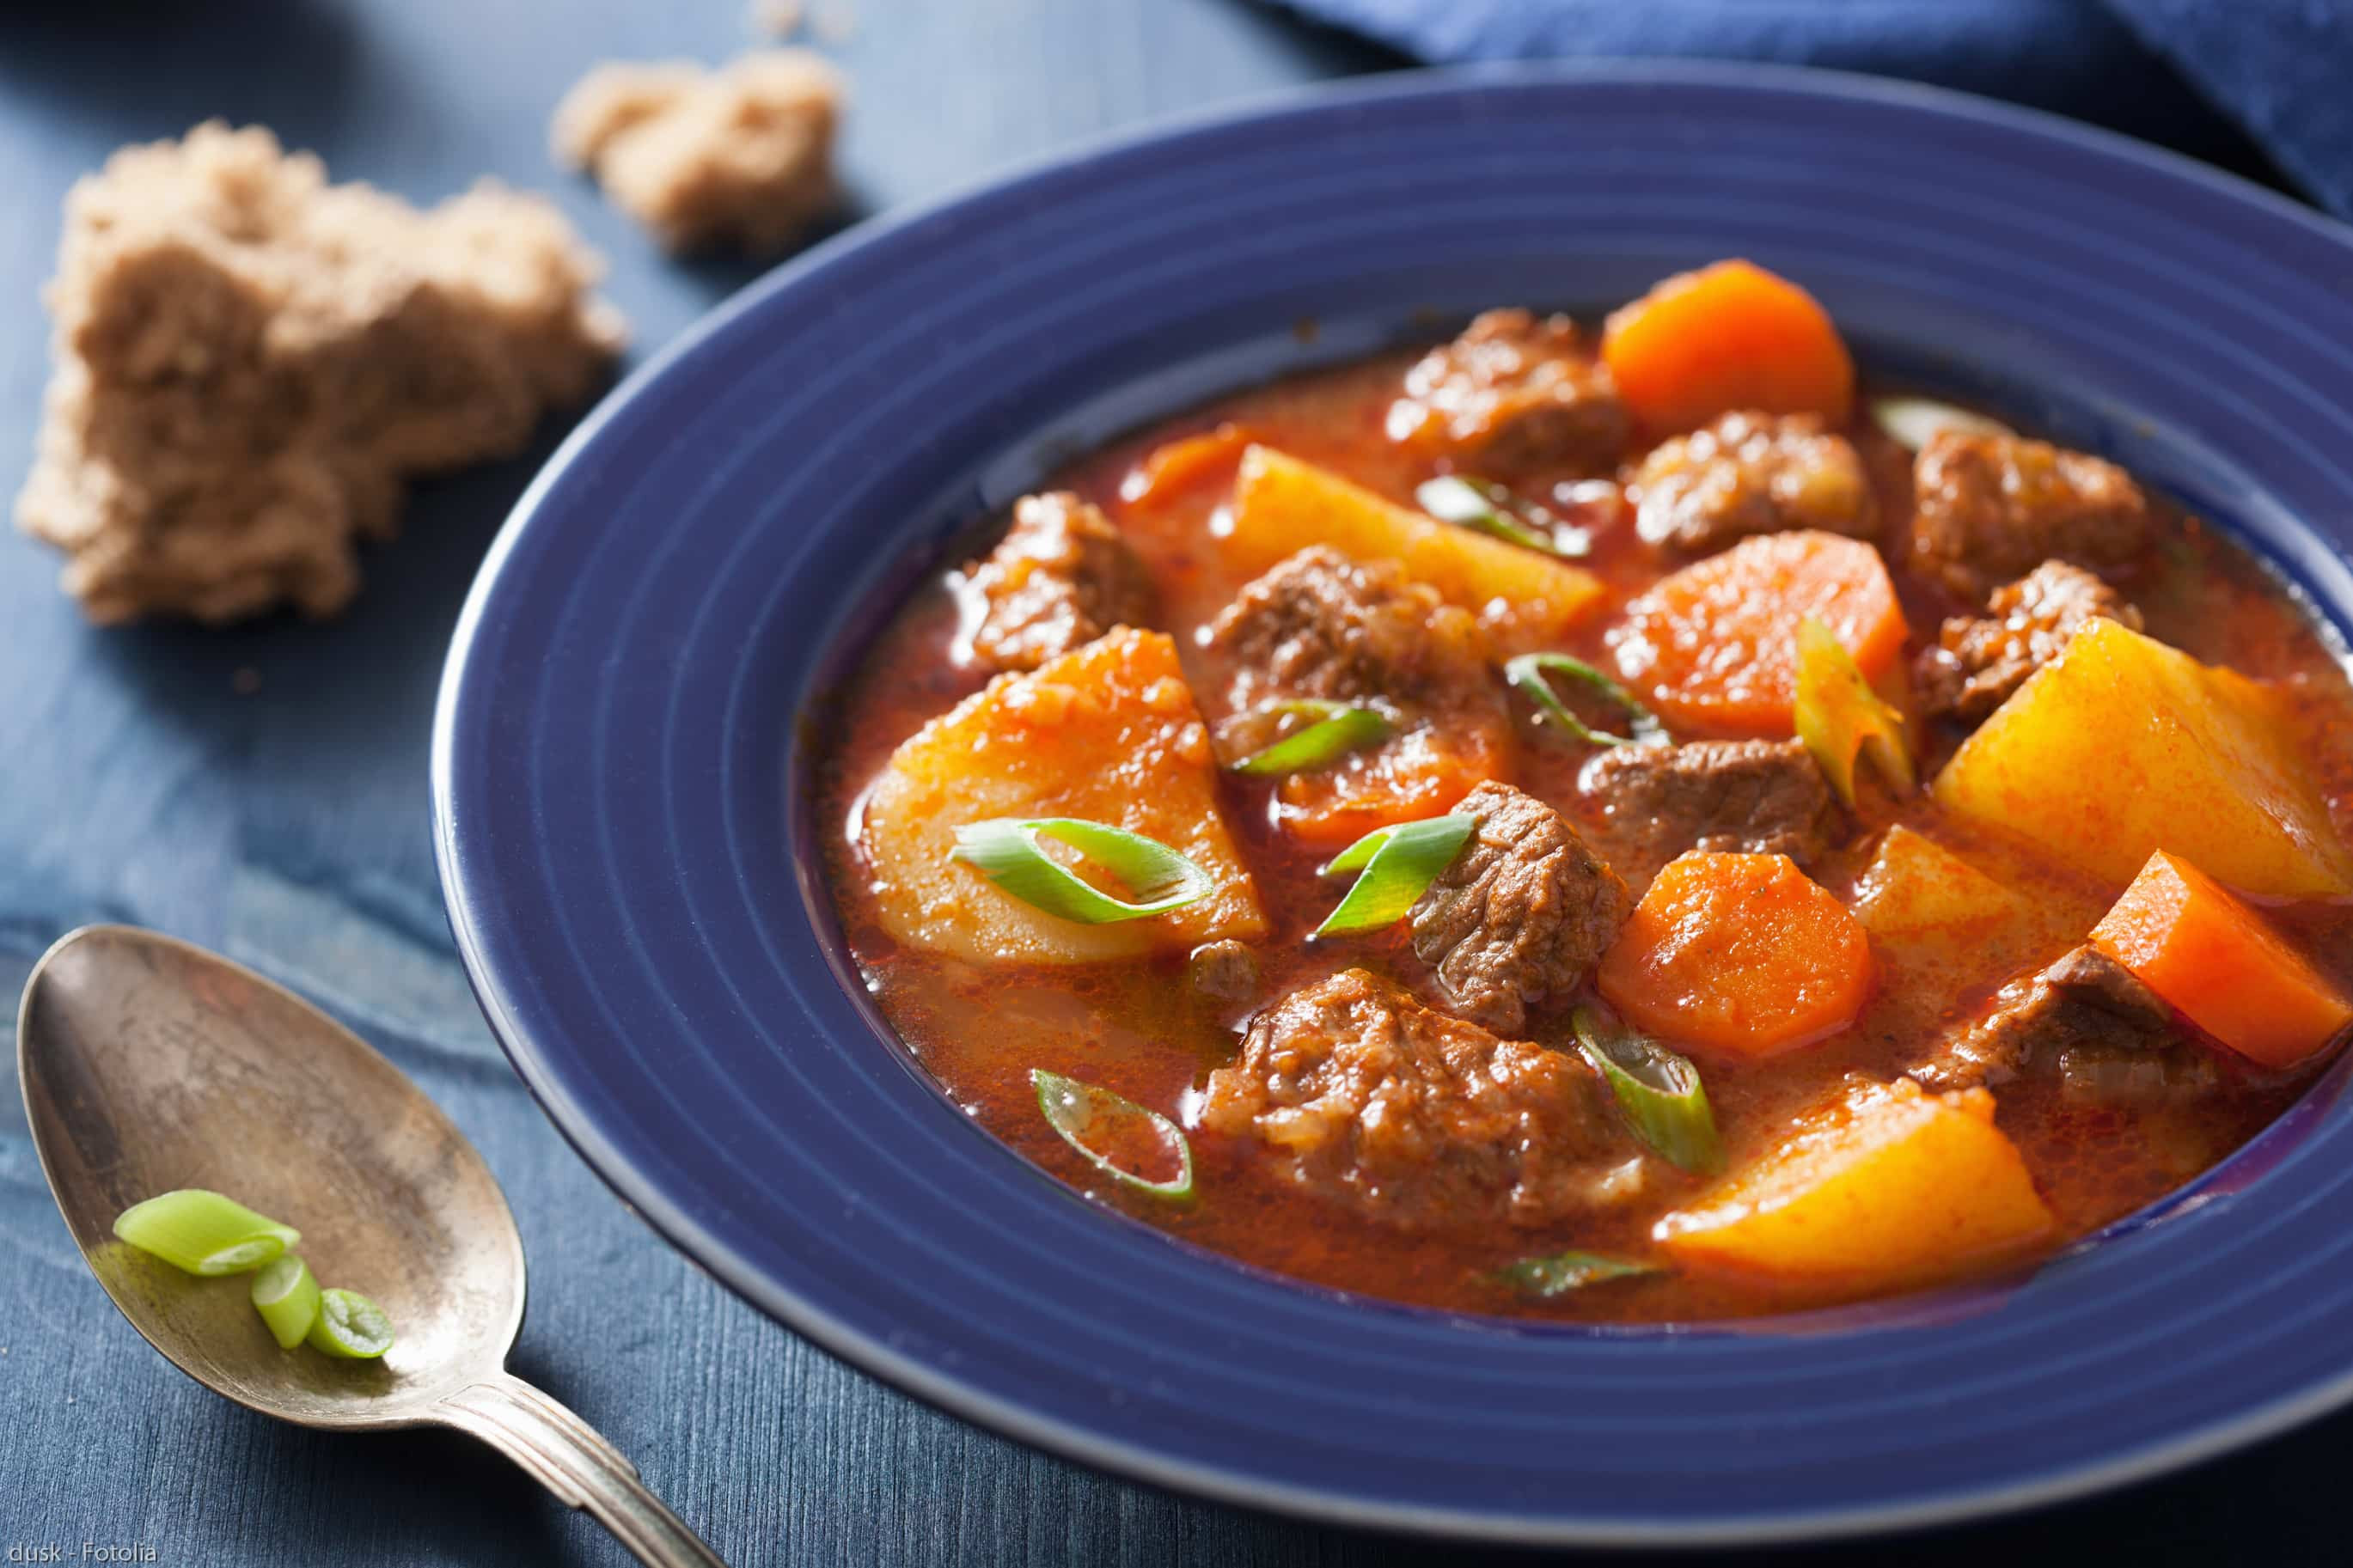 Beef Stew In Crockpot  Weight Watchers Crock Pot Recipes Slow Cooker Recipes